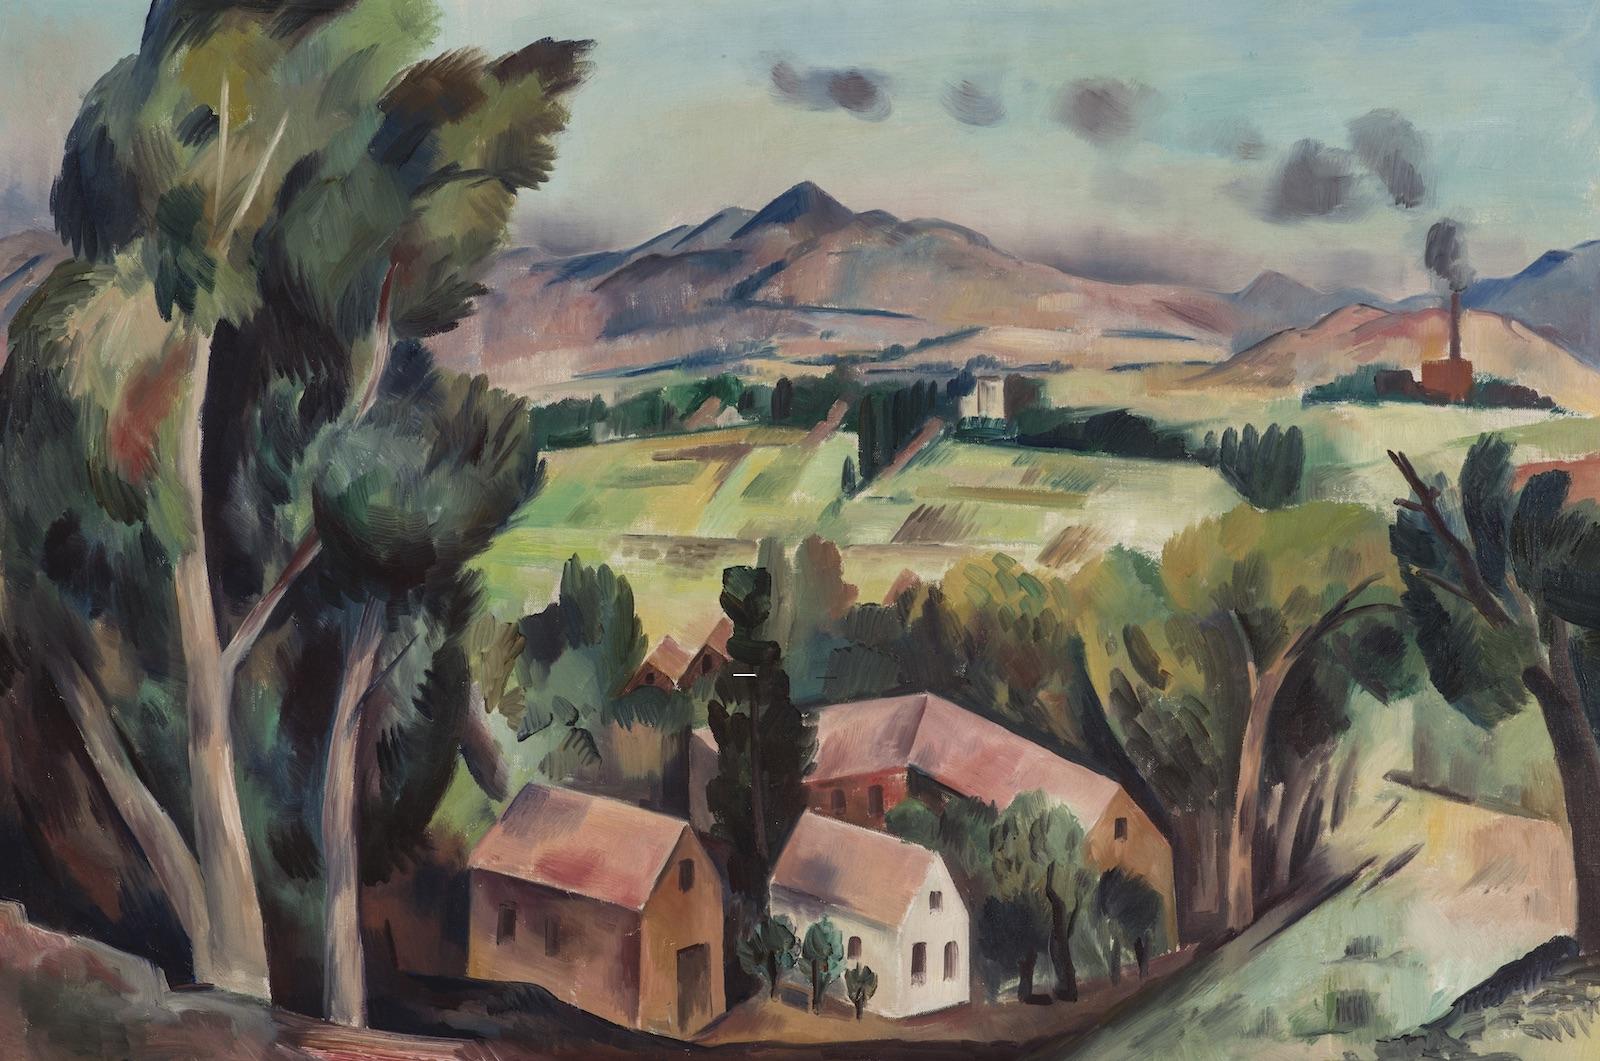 B.J.O. Nordfeldt, Santa Fe